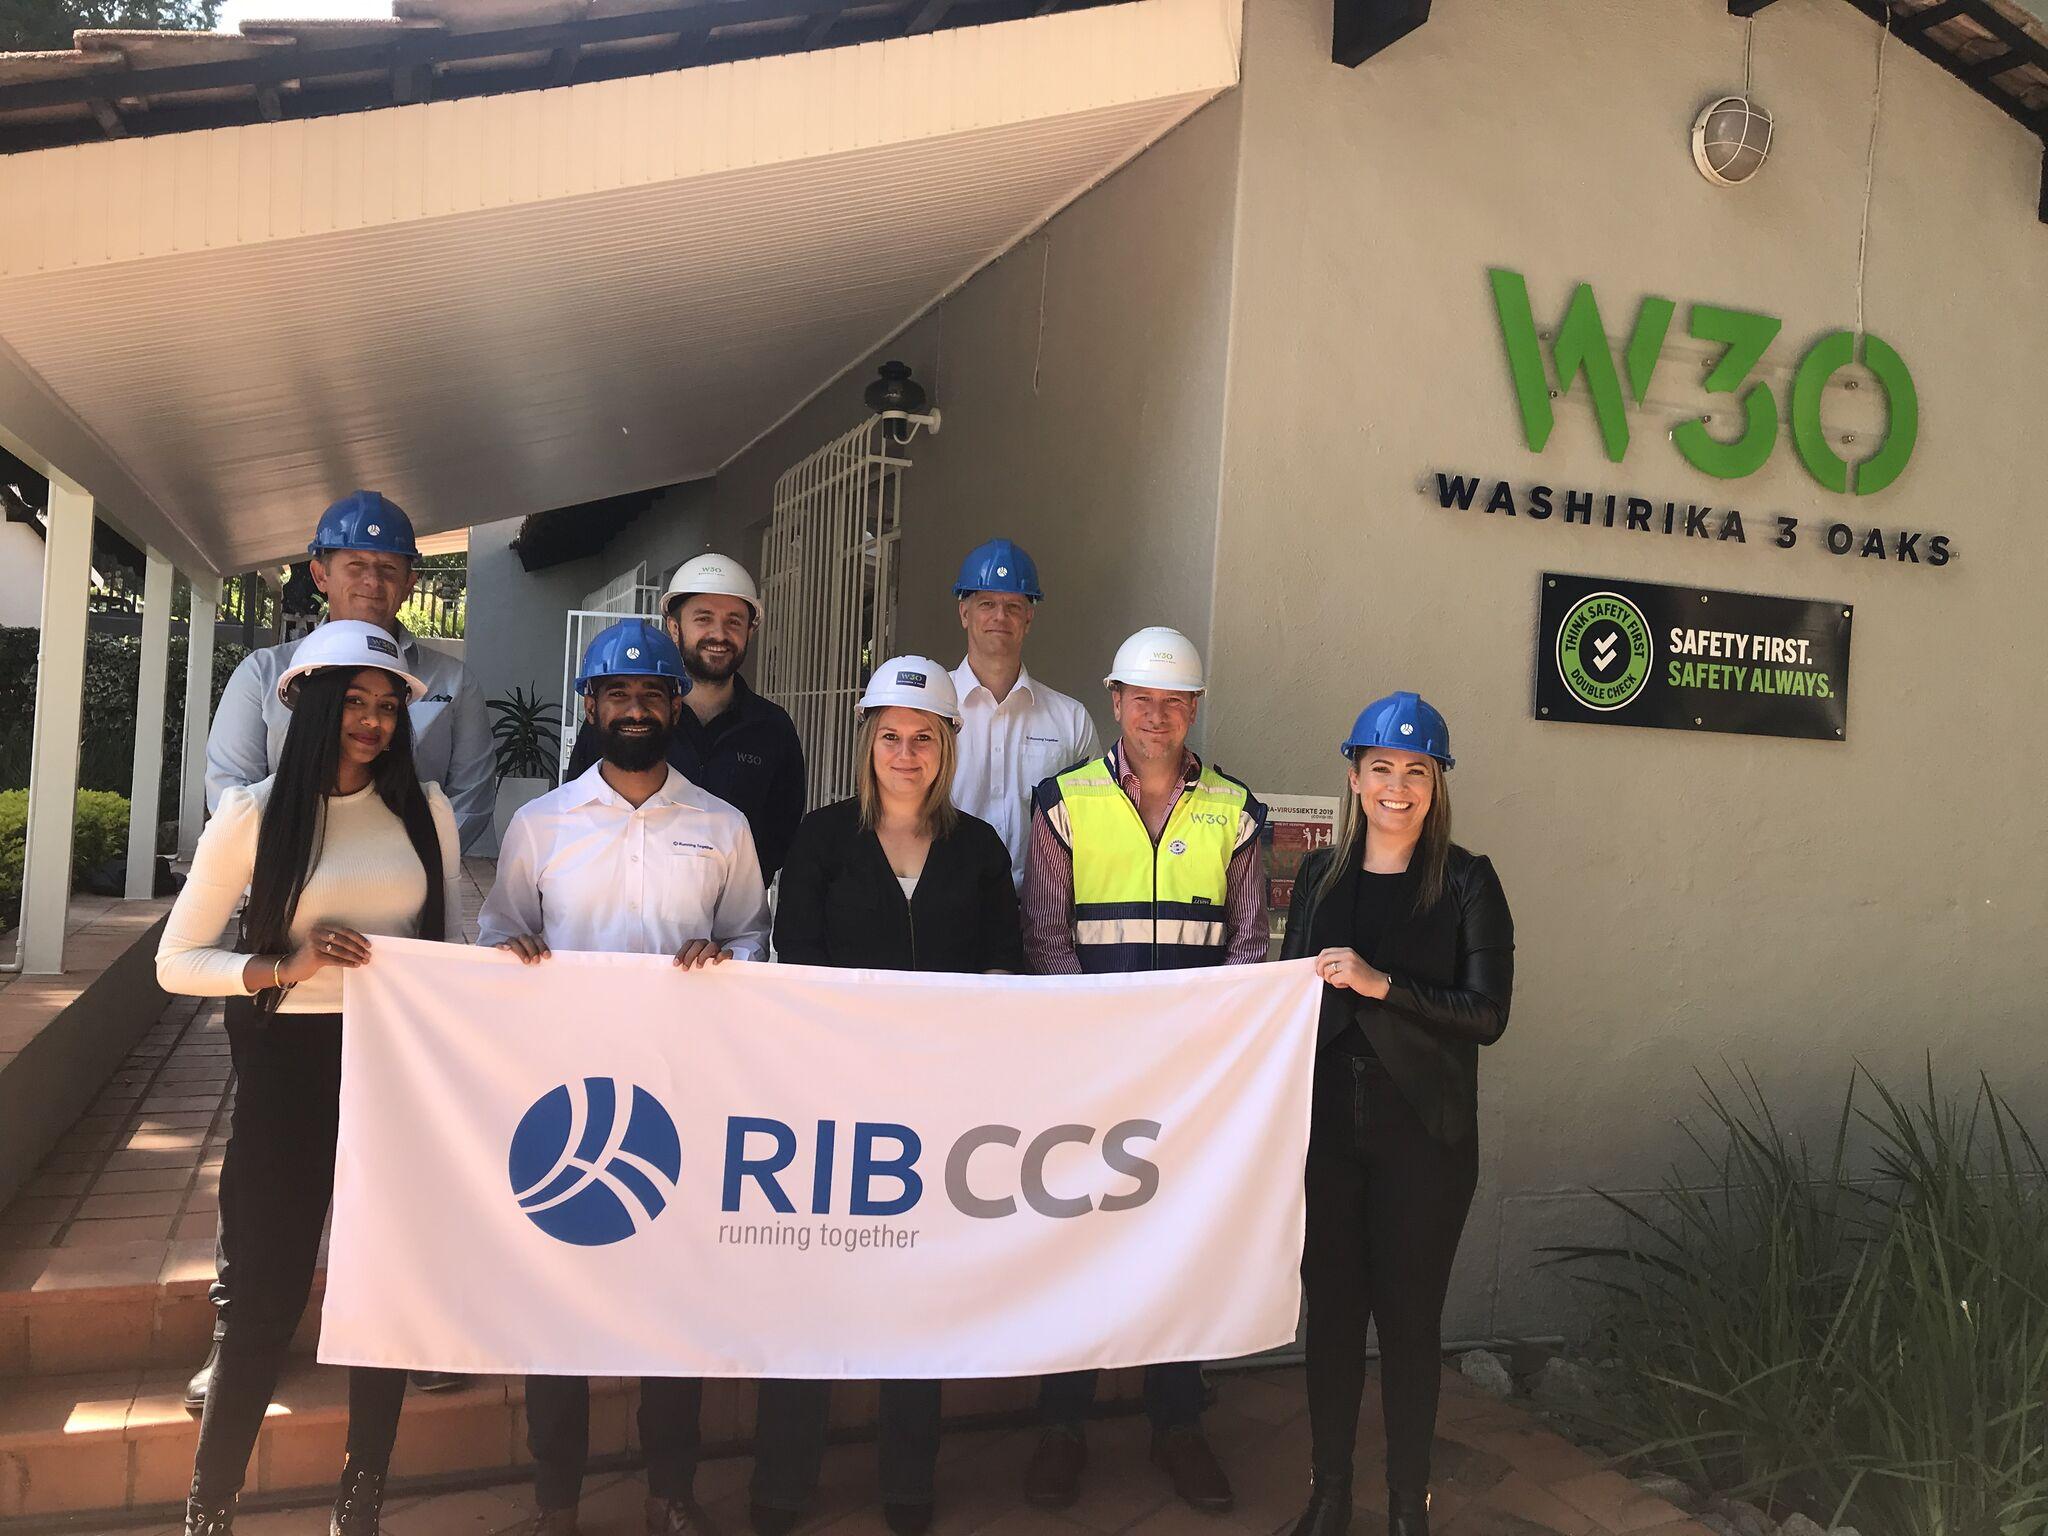 Washirika 3 Oaks team members holding the RIB CCS banner